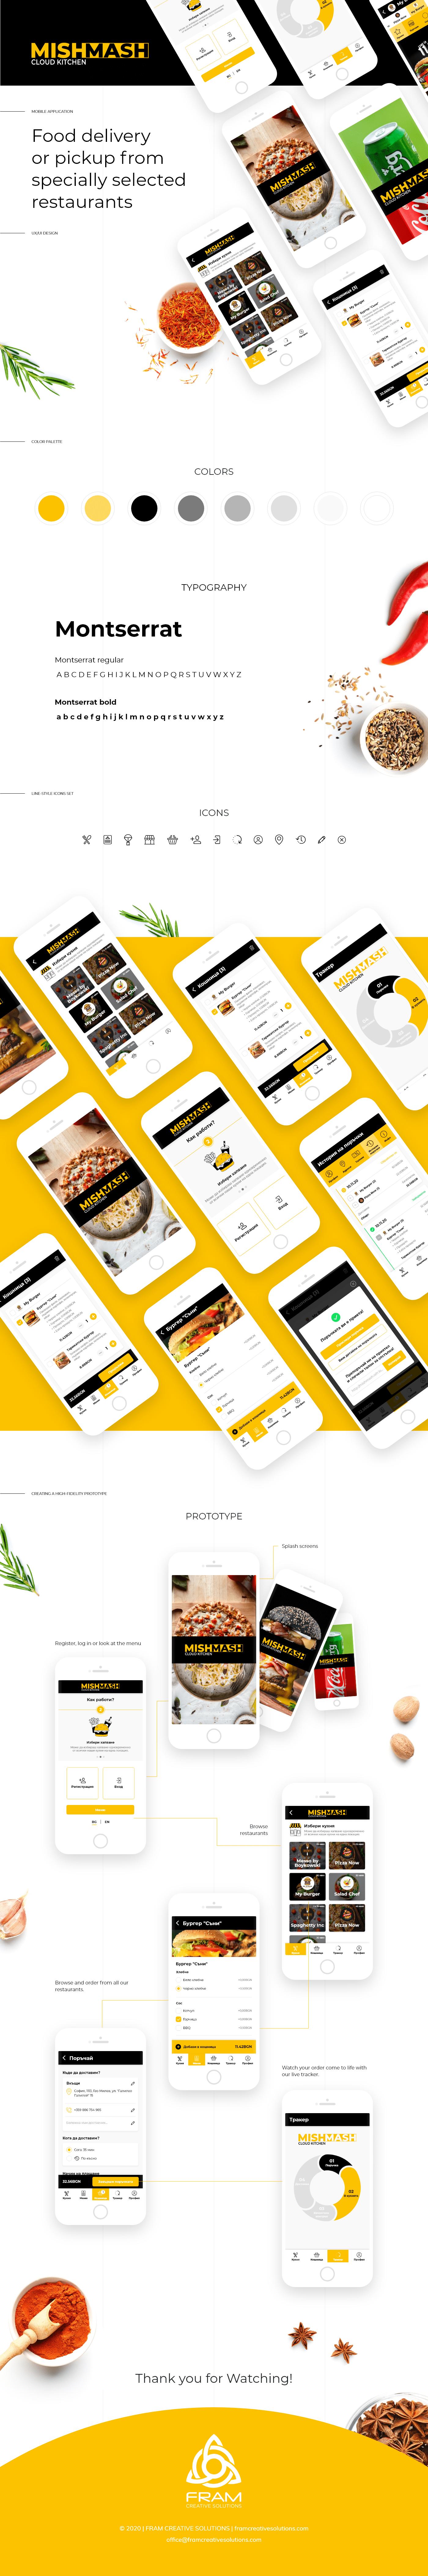 application branding  delivery Food  UI ux ux/ui